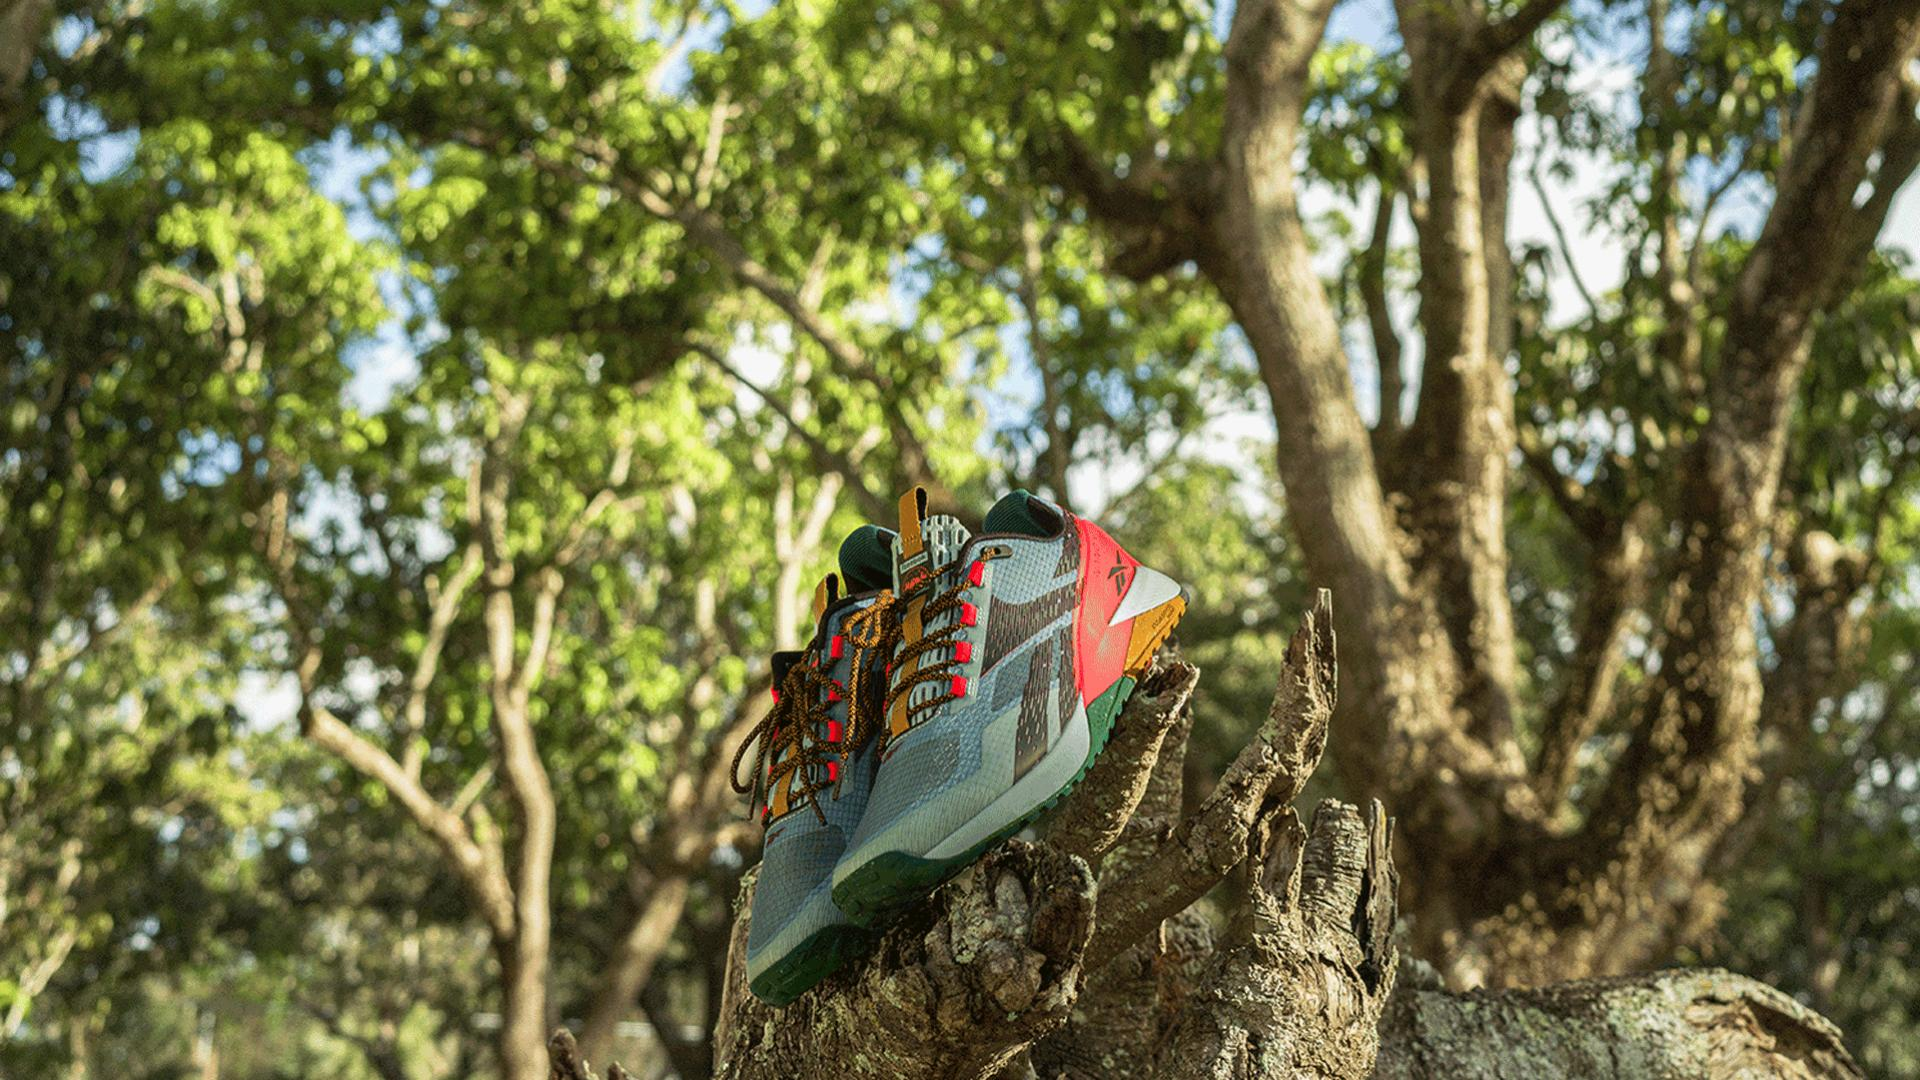 Reebok's Nano X1 Adventure training shoe | Versatile and durable outdoor exercise sneakers